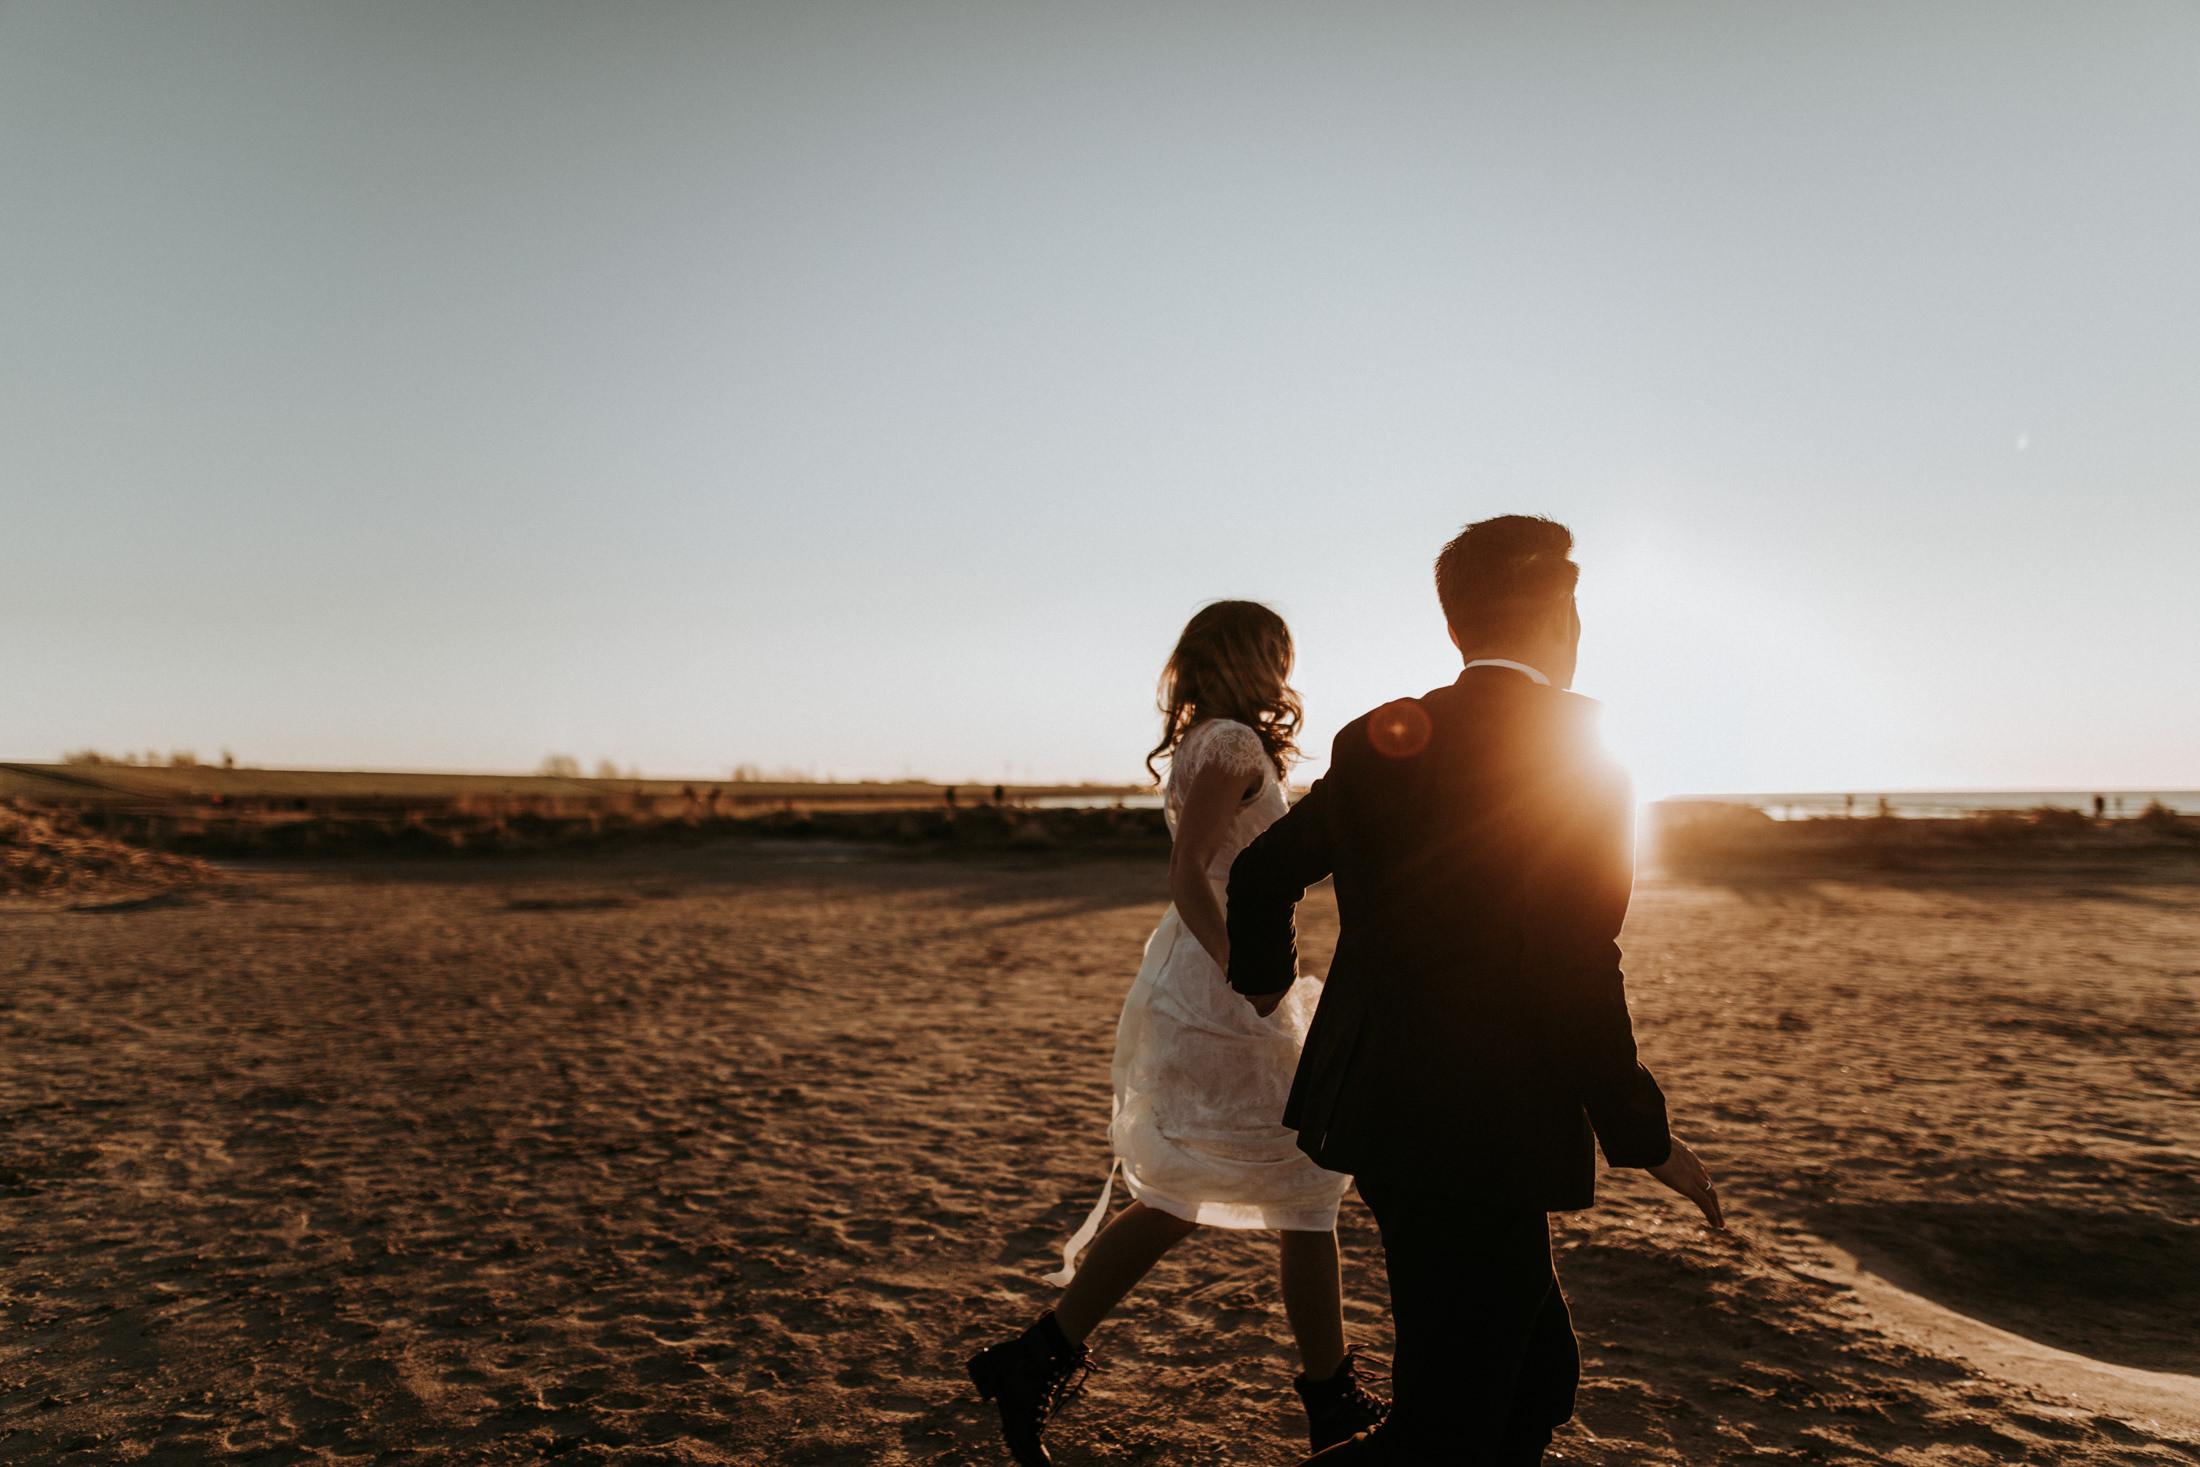 Wedding_Photographer_Mallorca_Daniela-Marquardt_Photography_CanaryIslands_Lanzarote_Iceland_Tuskany_Santorini_Portugal_Schweiz_Austria_Bayern_Elopement_Hochzeitsfotograf_Norddeichich_59